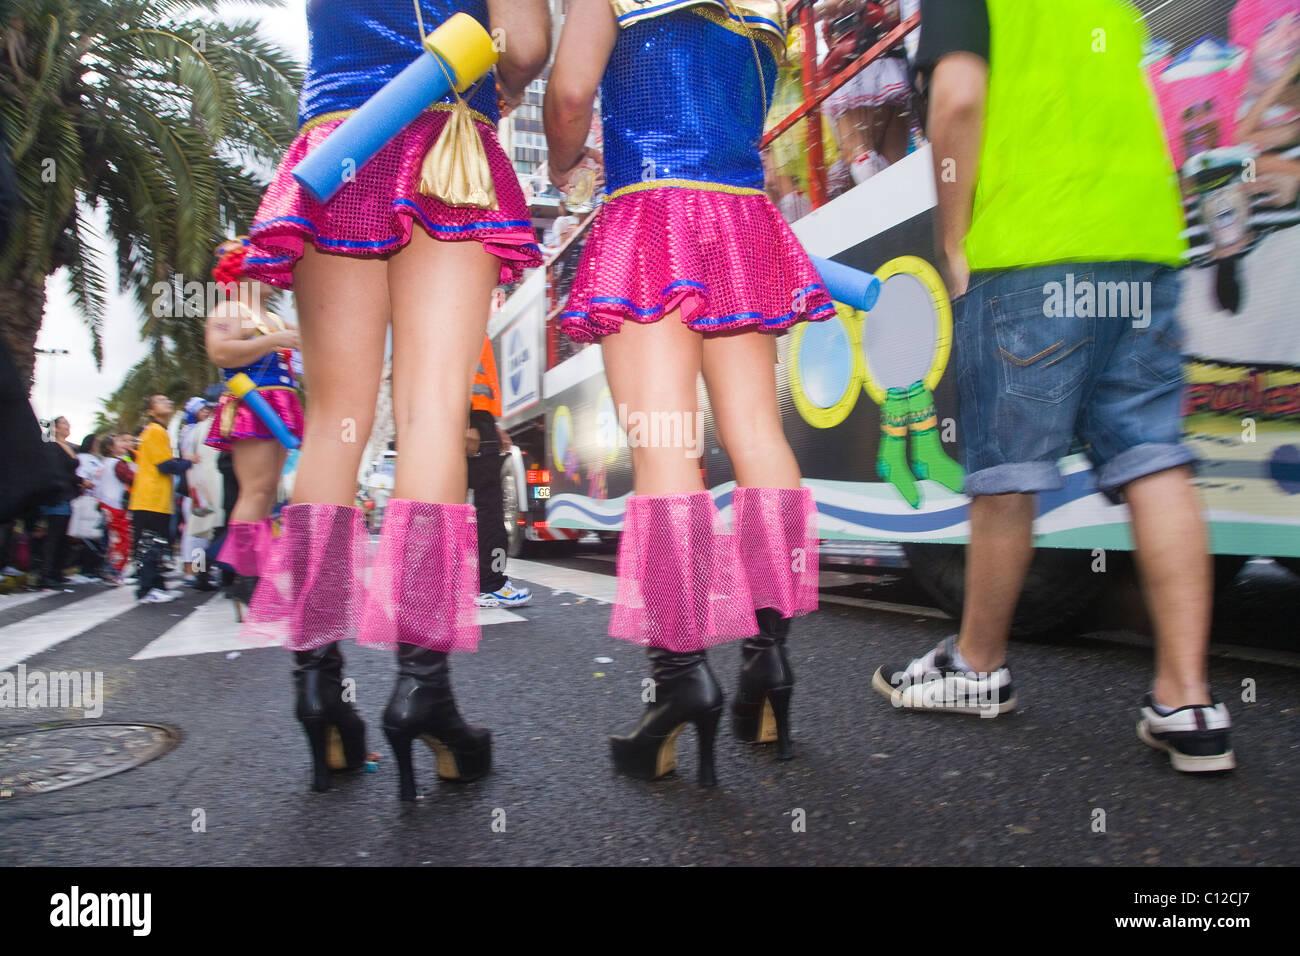 f42a52fcc3d Drag Queen Carnival On Gran Stock Photos & Drag Queen Carnival On ...